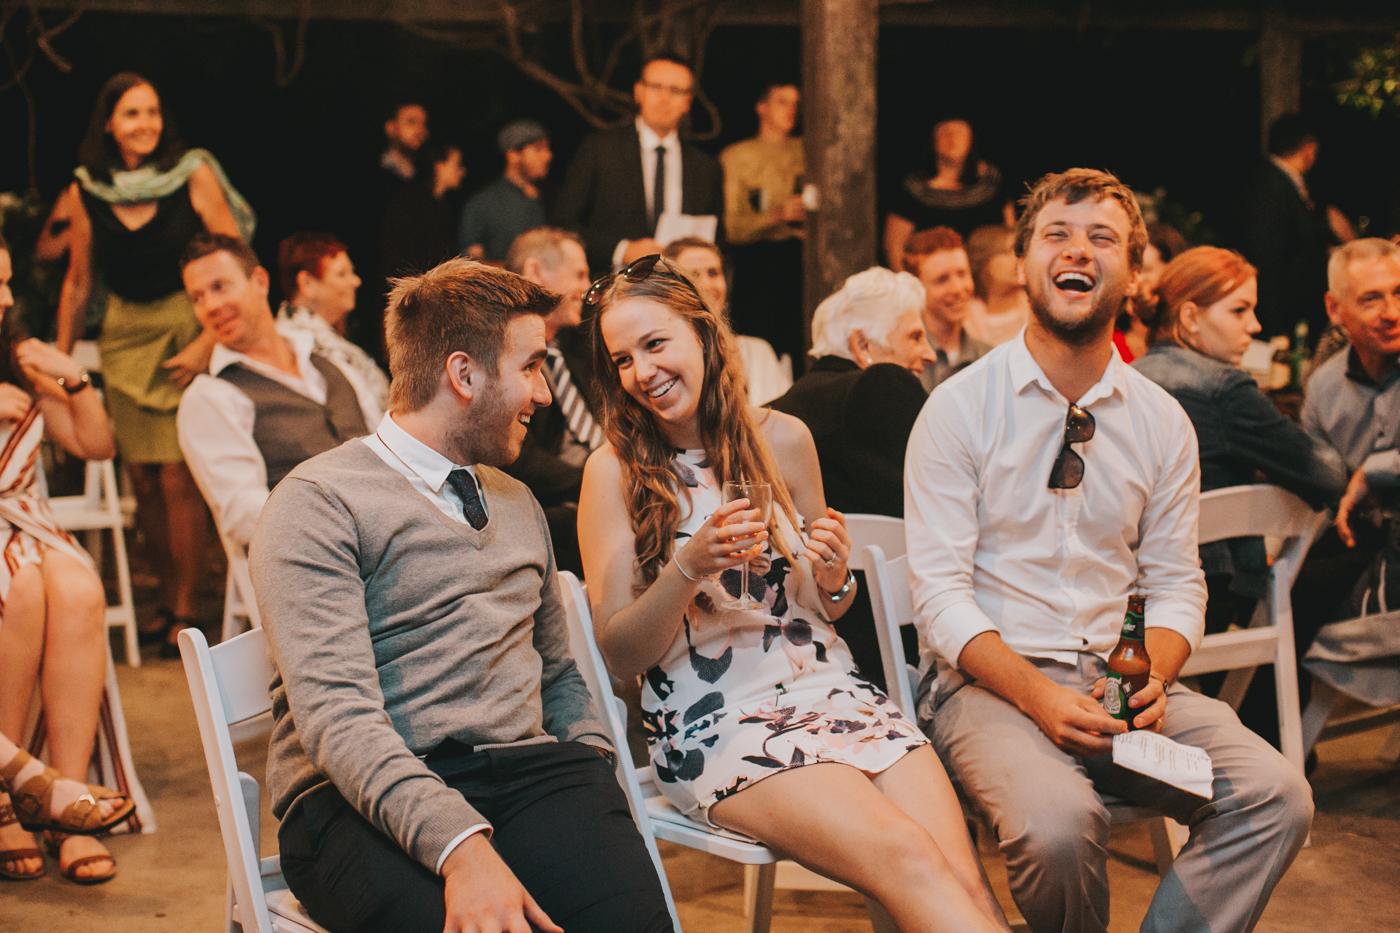 Rachel & Jacob - Willow Farm Berry - South Coast Wedding - Samantha Heather Photography-188.jpg